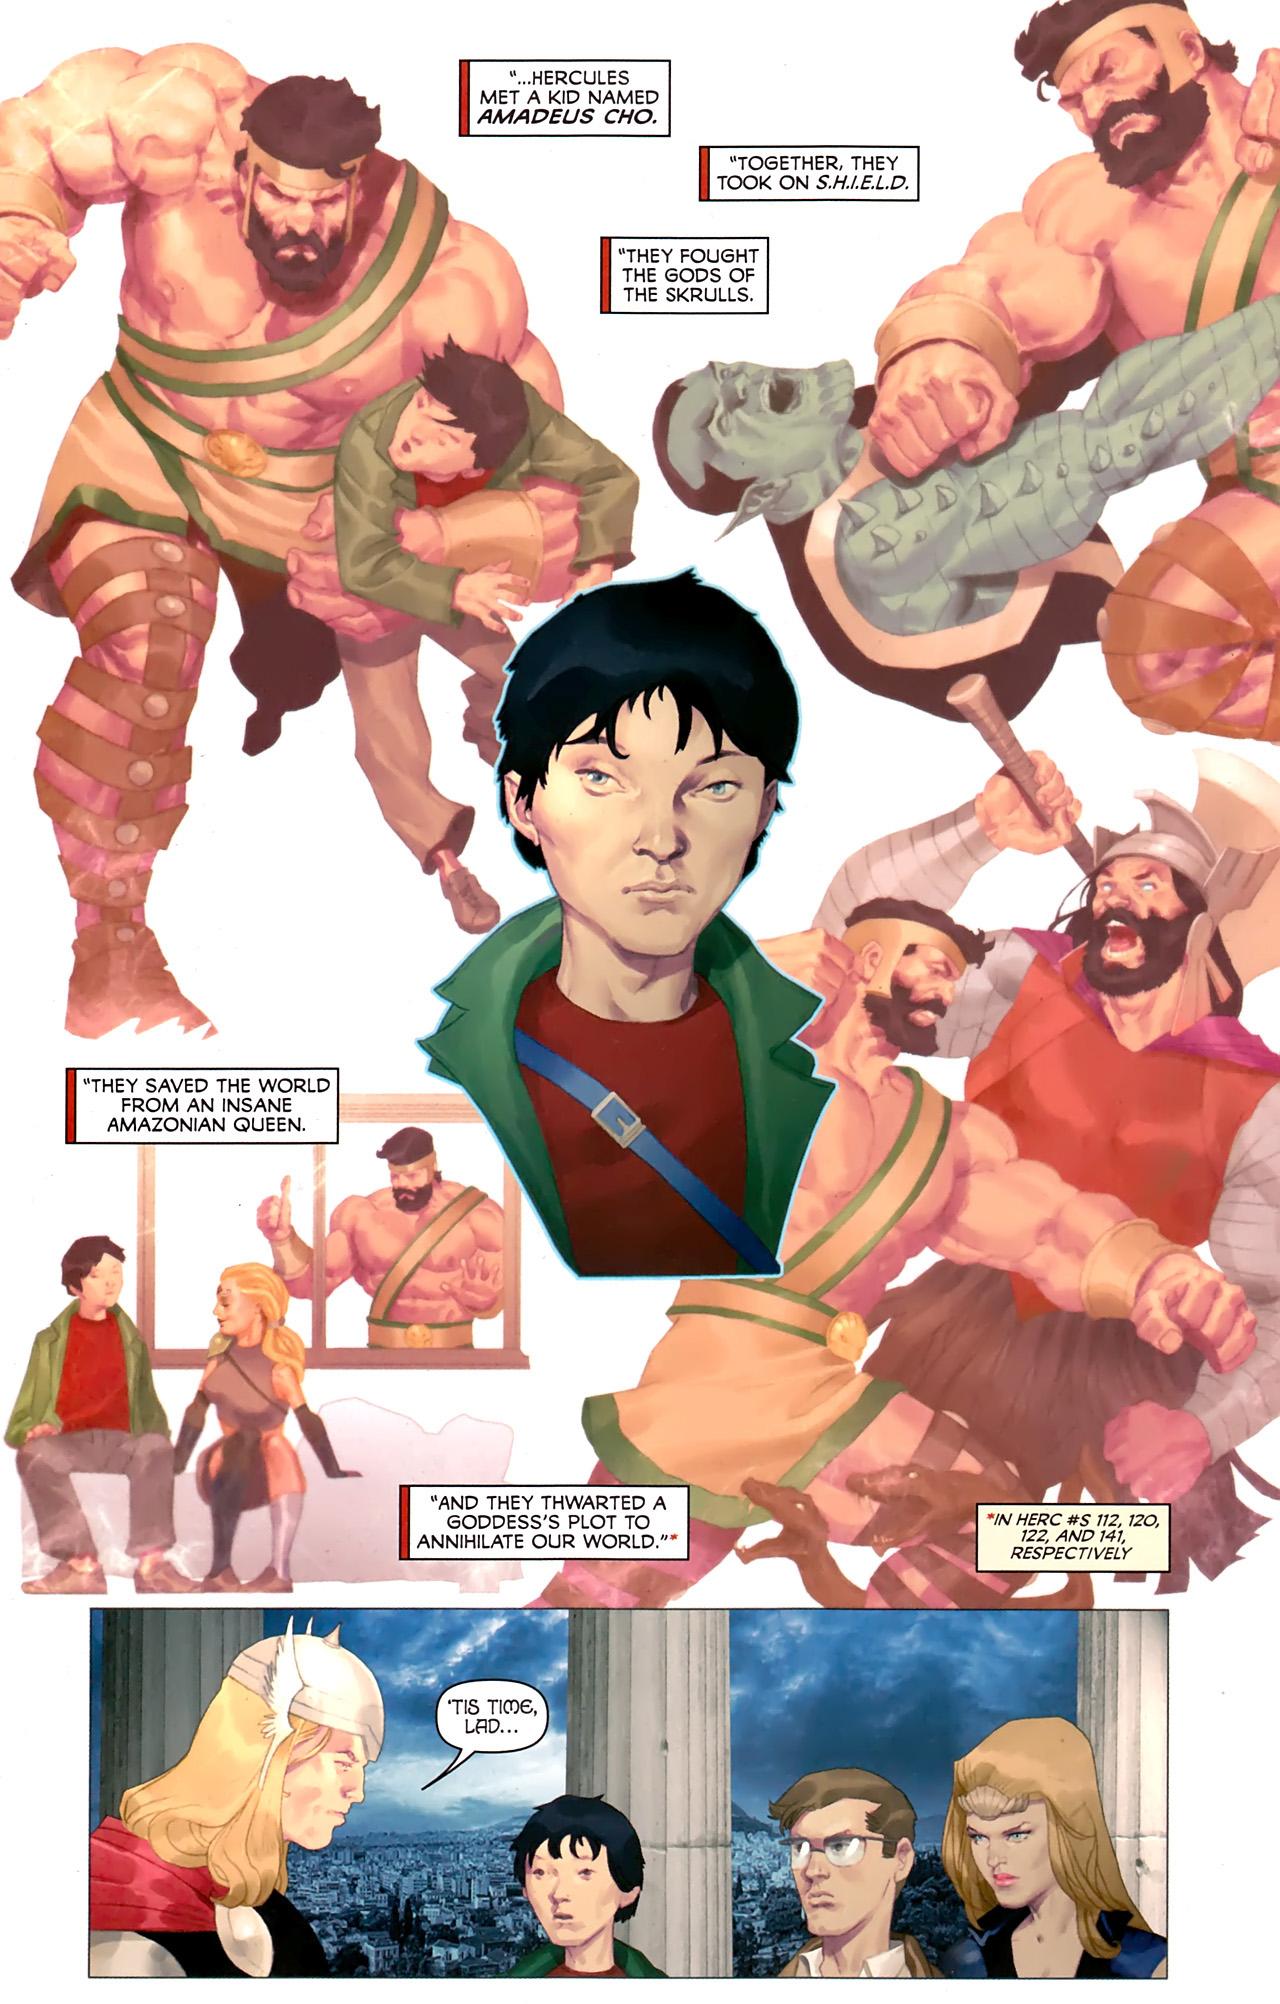 Read online Hercules: Fall of an Avenger comic -  Issue #1 - 19